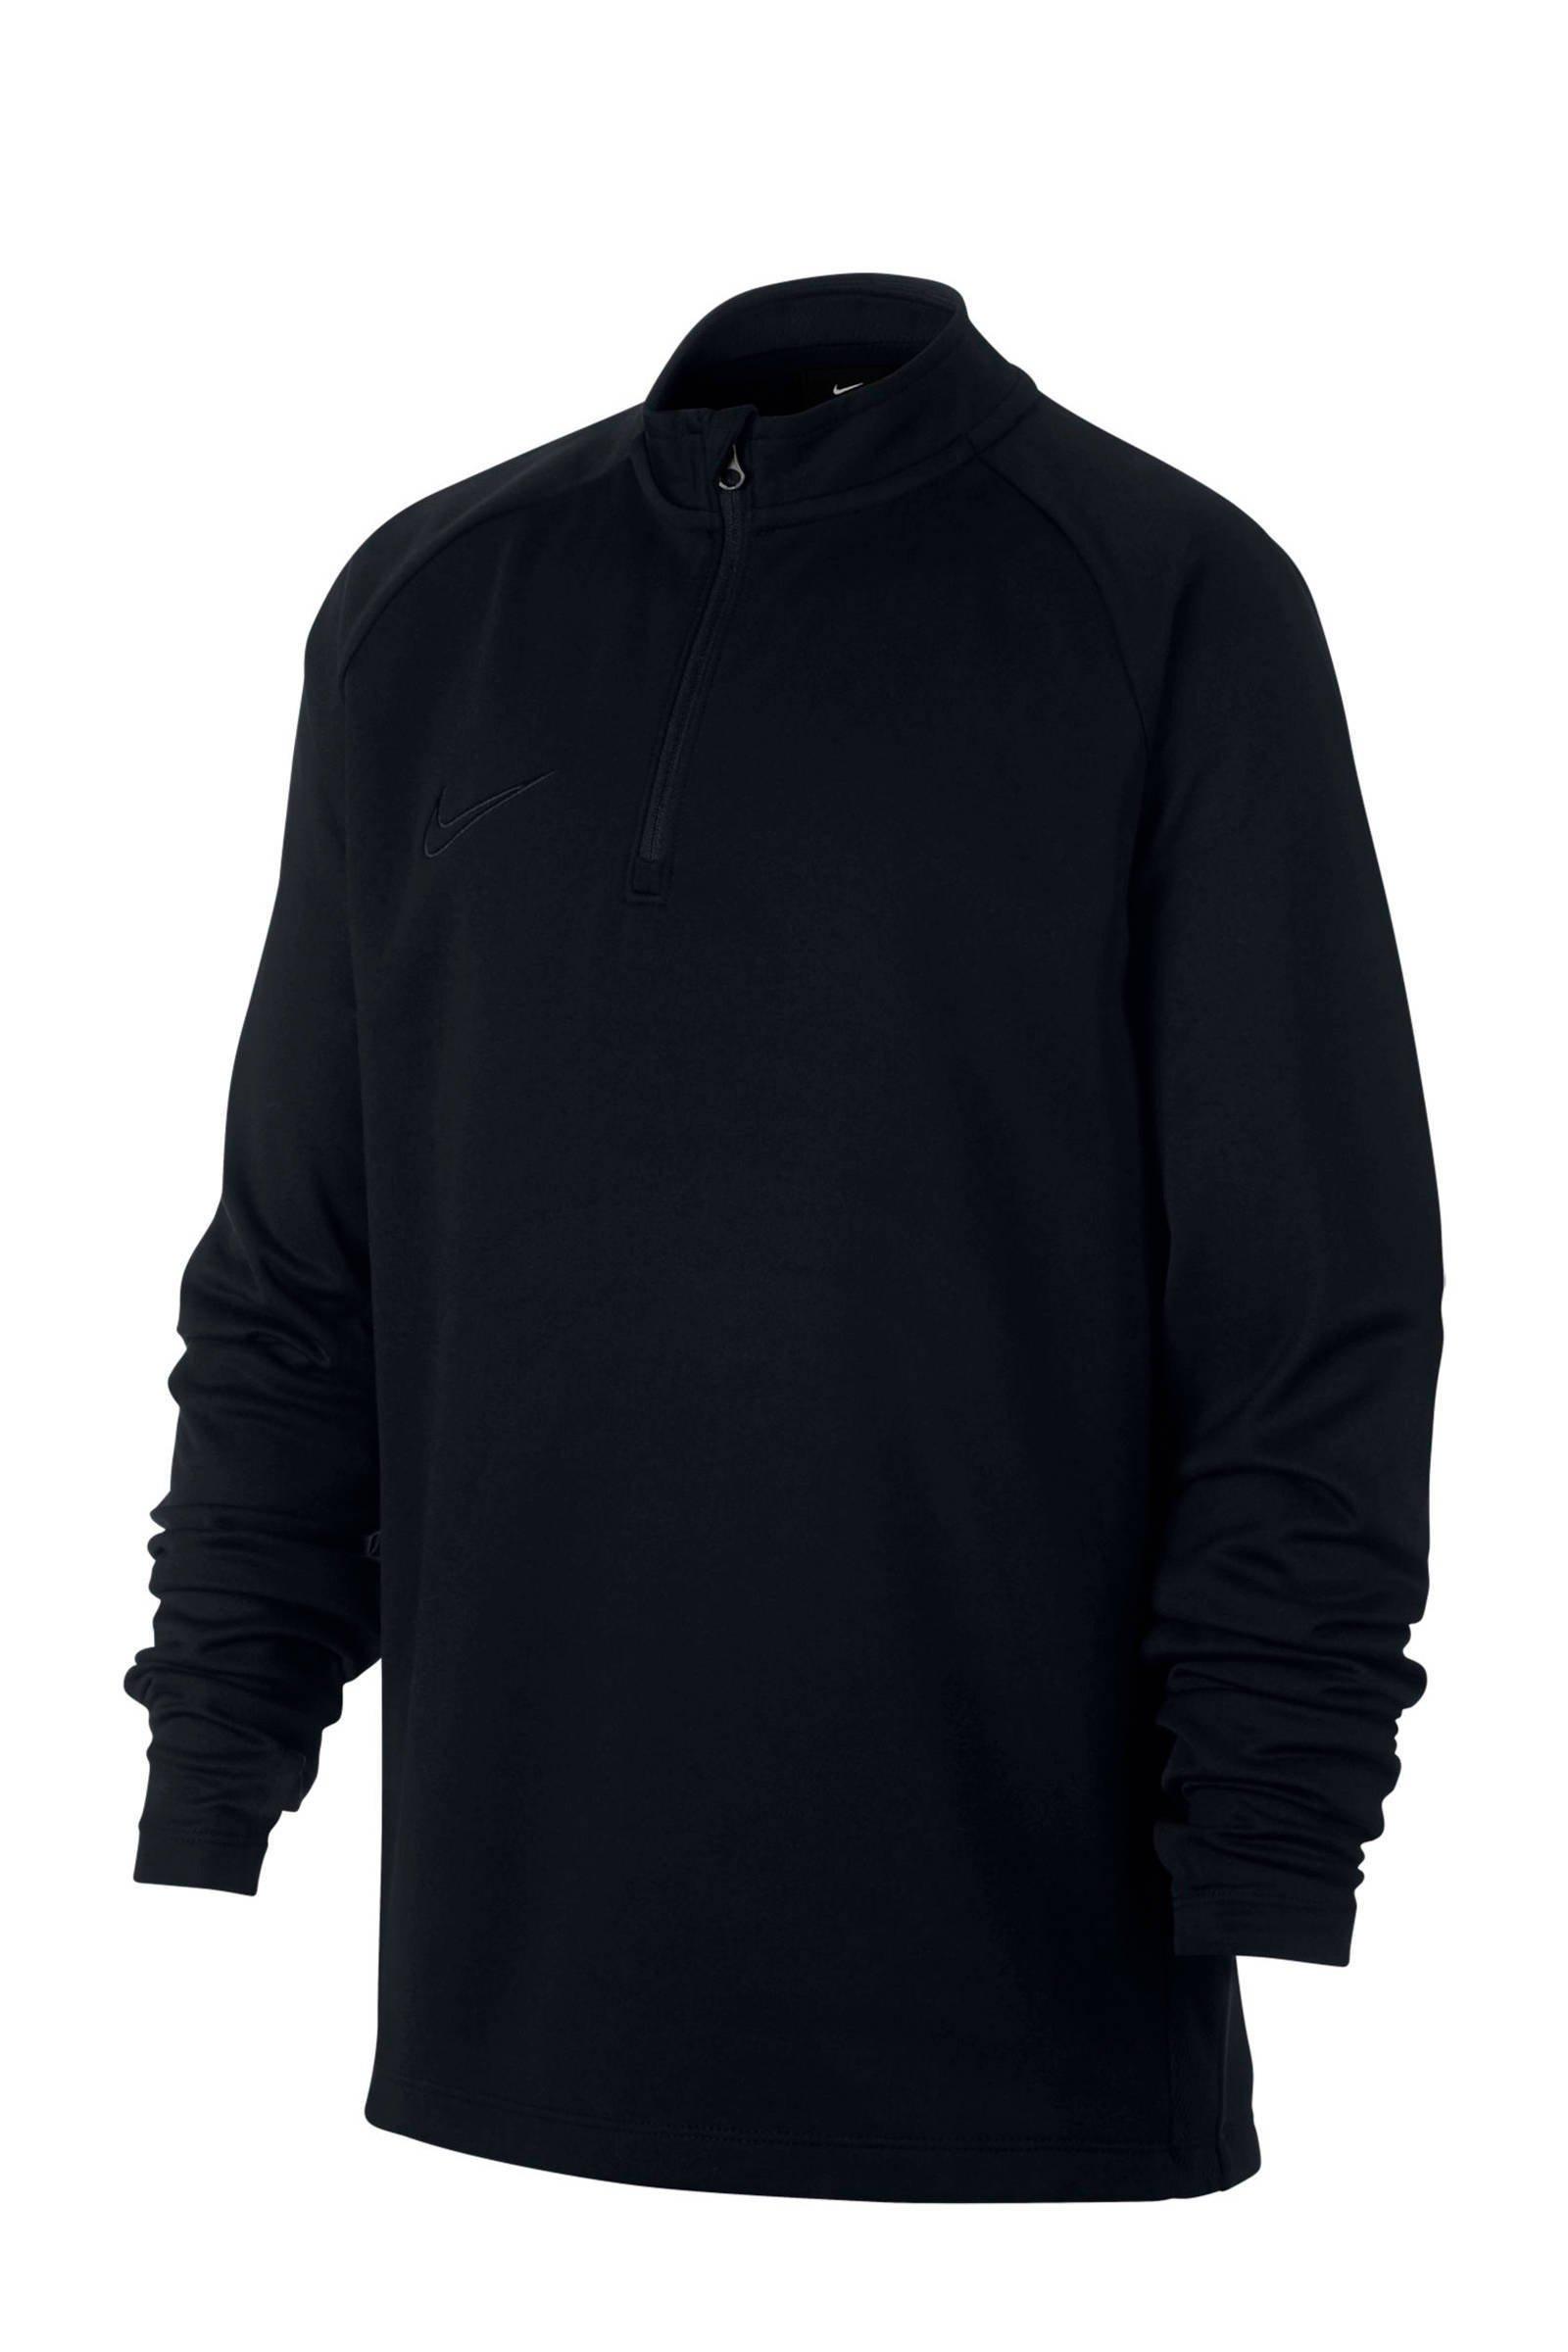 Nike voetbalshirt zwart - maat 128/140